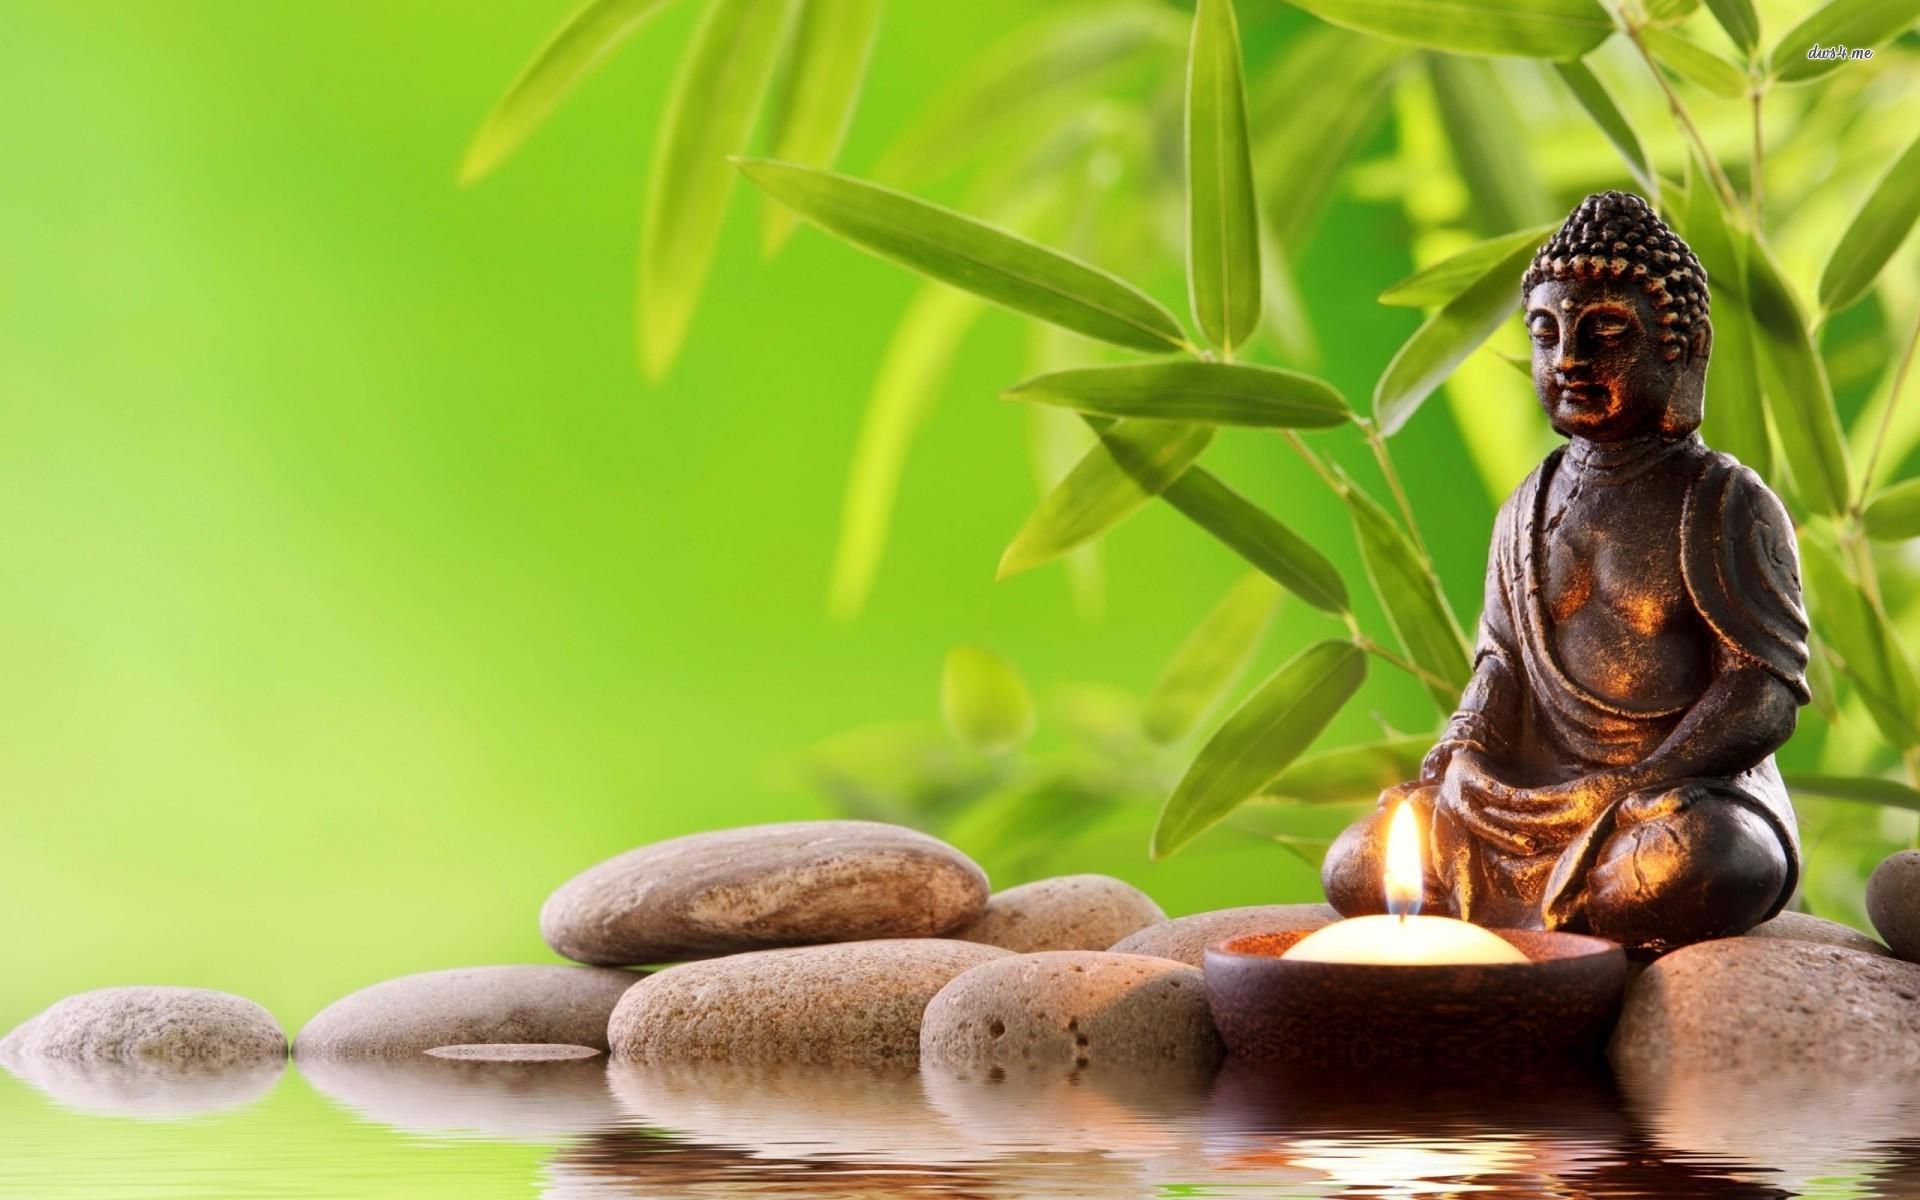 Hd wallpaper zen - Buddha Wallpaper Hd Zen Quote Wallpaper Hd Zen Garden Wallpaper